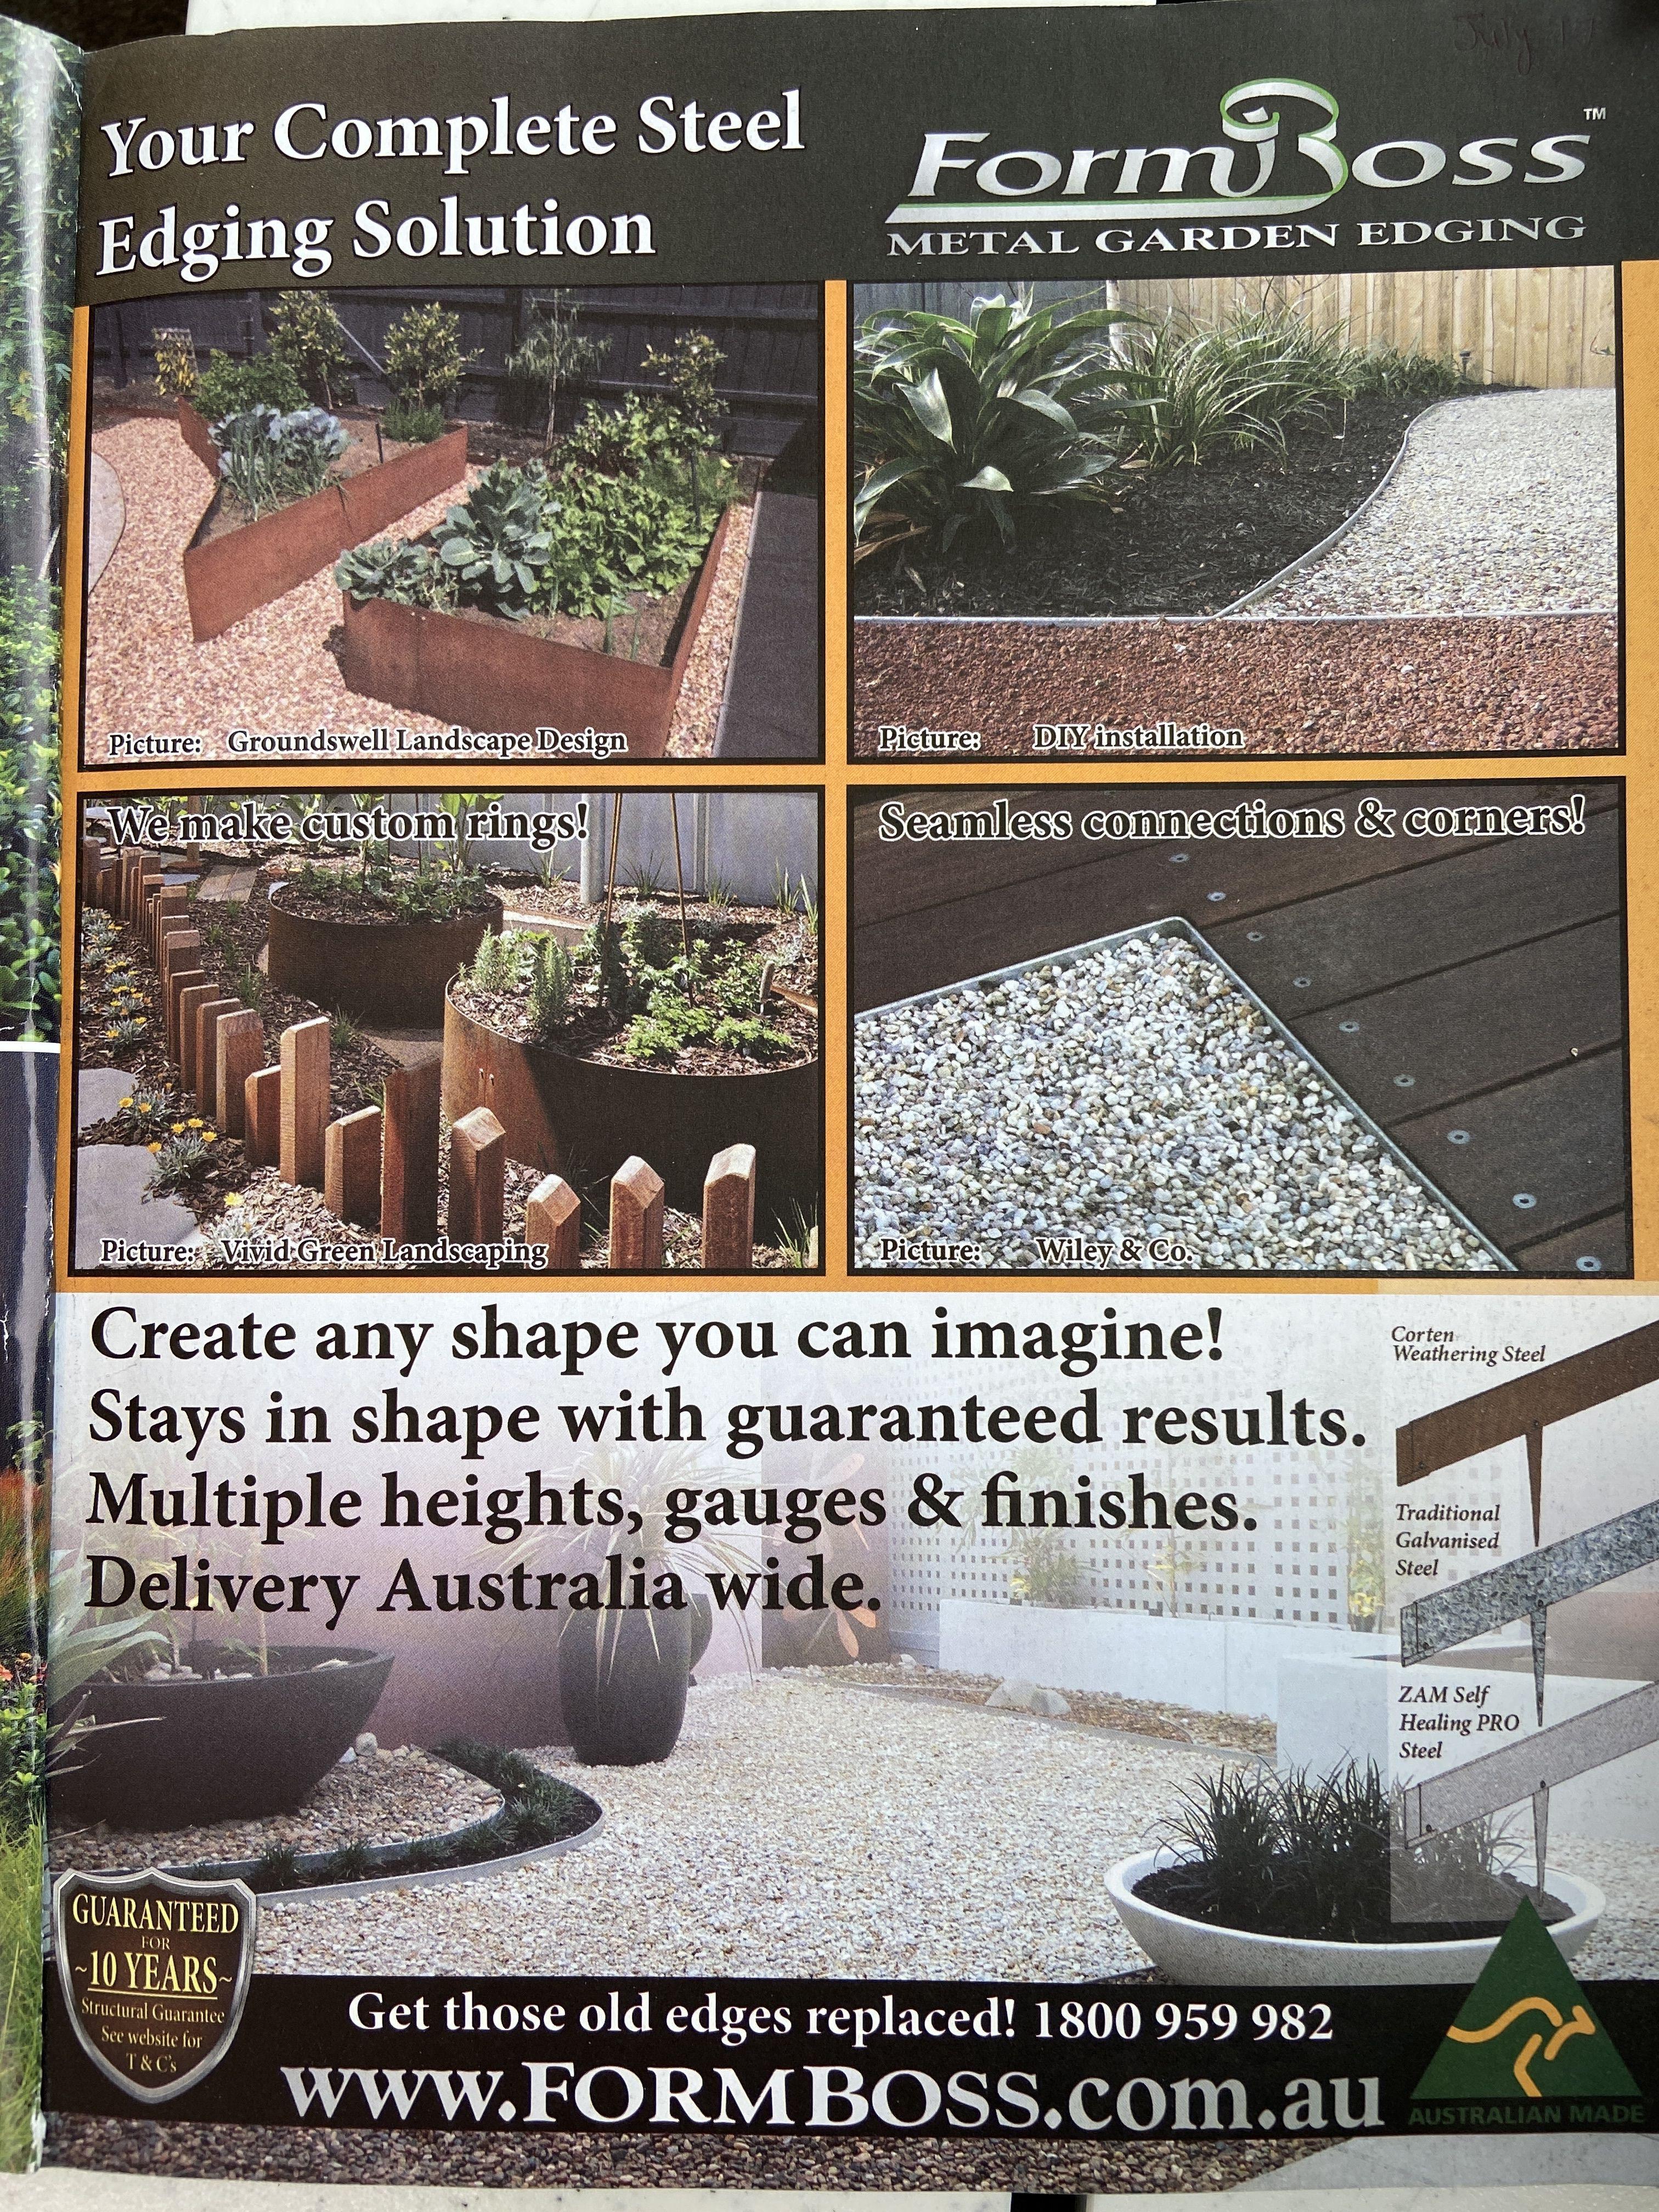 Garden edging in 2020 Garden edging, Metal garden edging